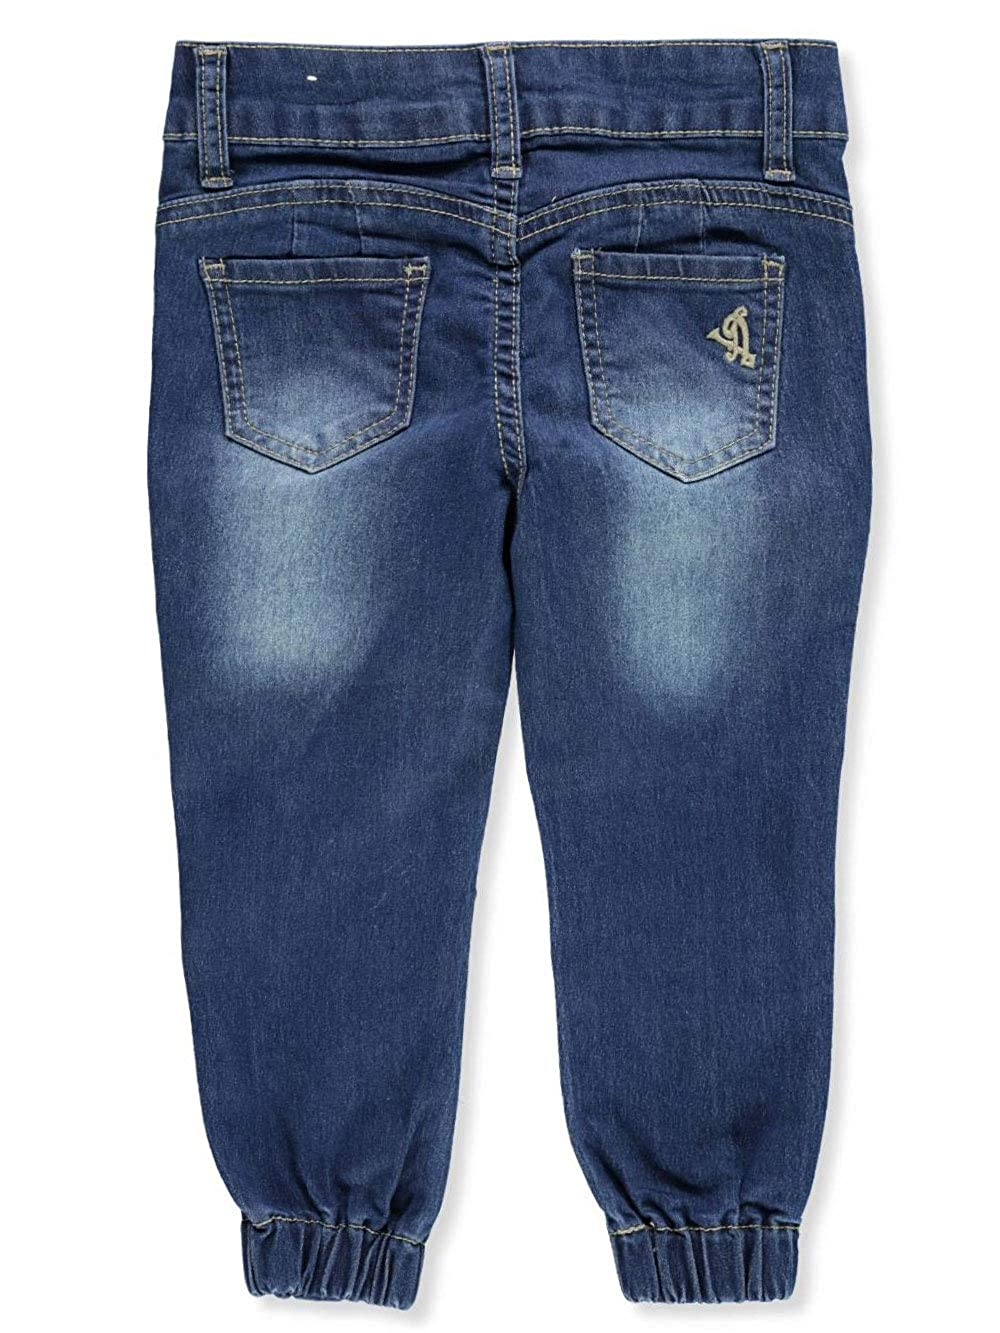 VIP Jeans Girls Joggers